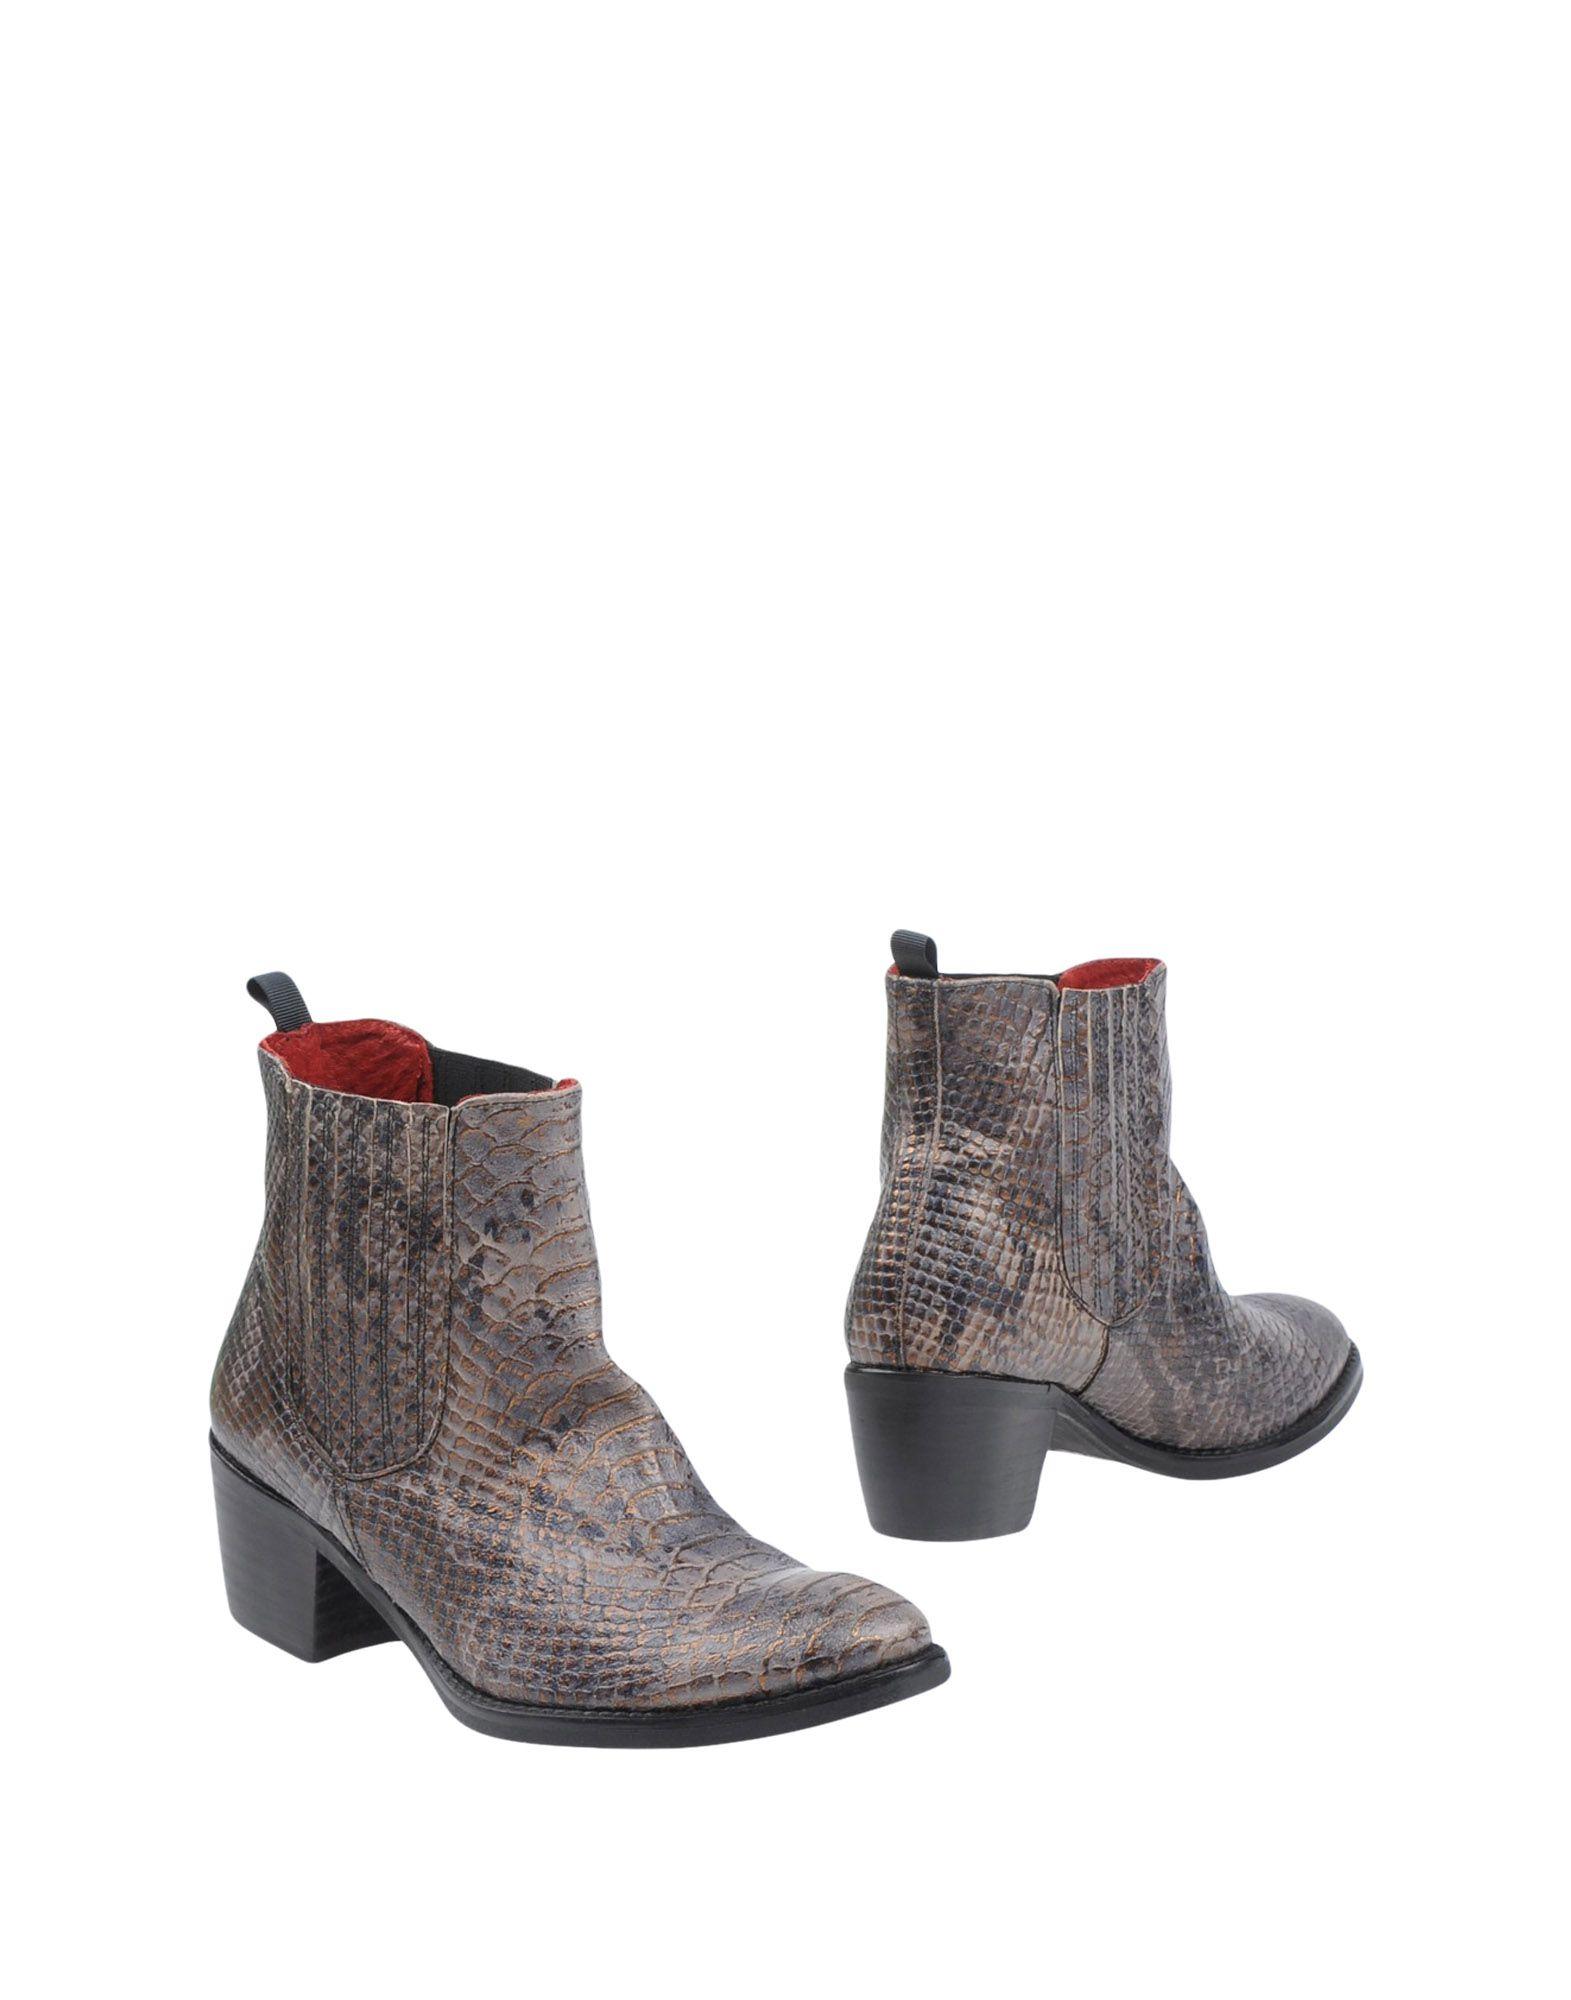 Bottine Vitelo Zapatos Femme - Bottines Vitelo Zapatos sur